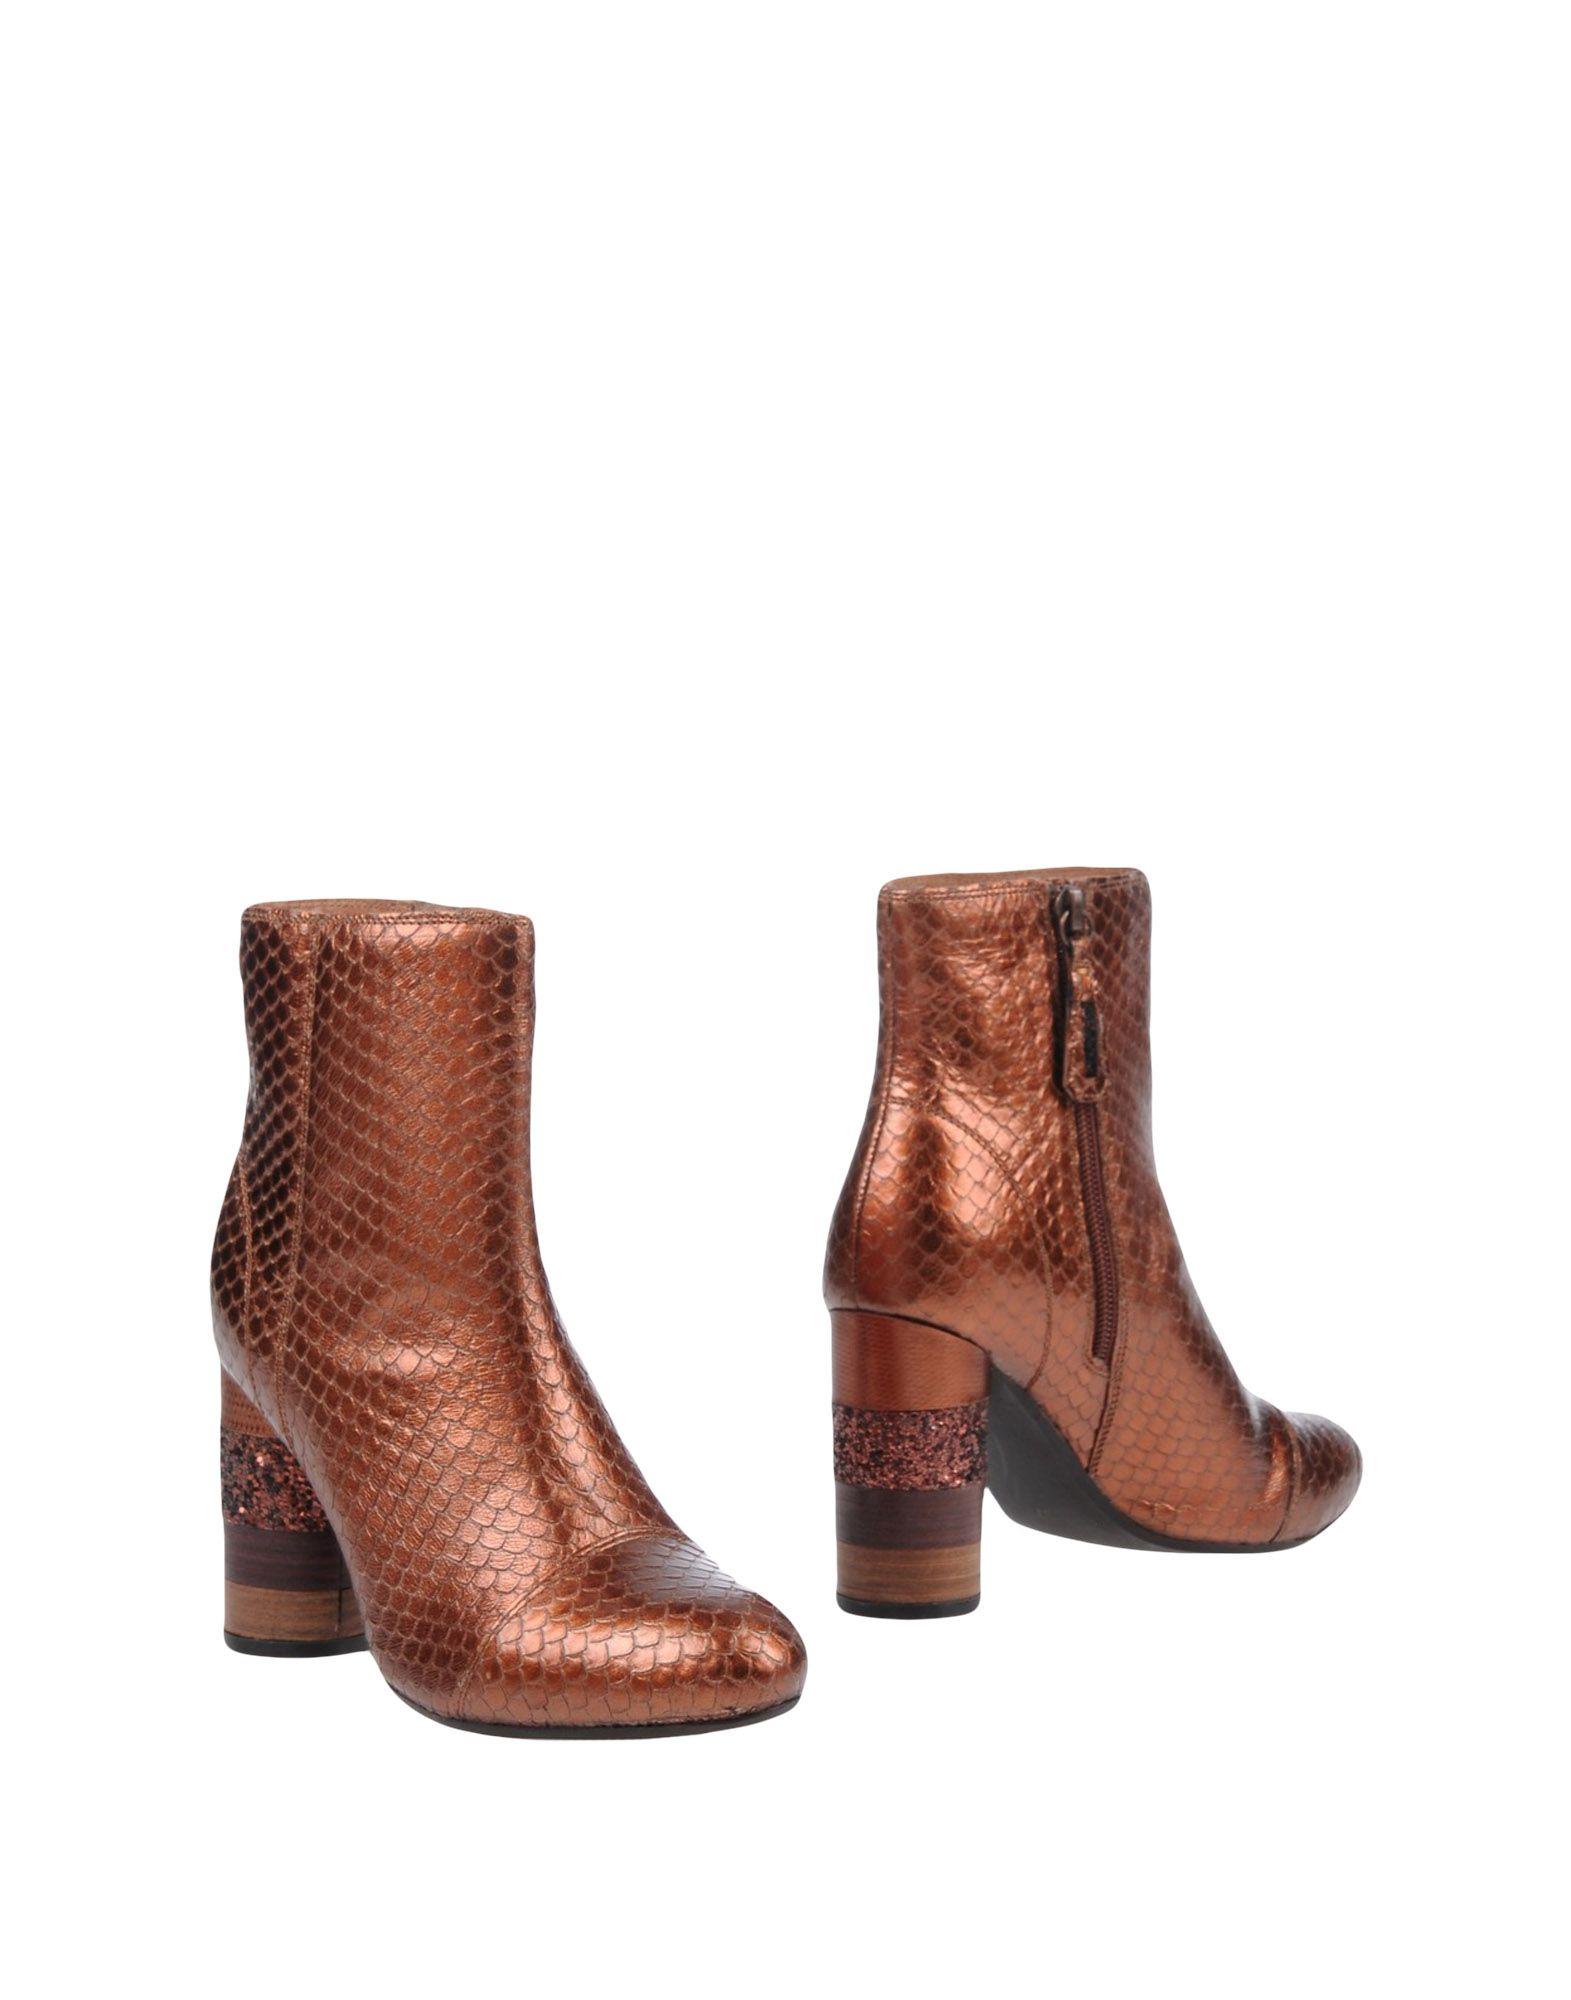 - - - les femmes gioseppo gioseppo bottines bottines en ligne le royaume - uni - 11460641xh dfda3e